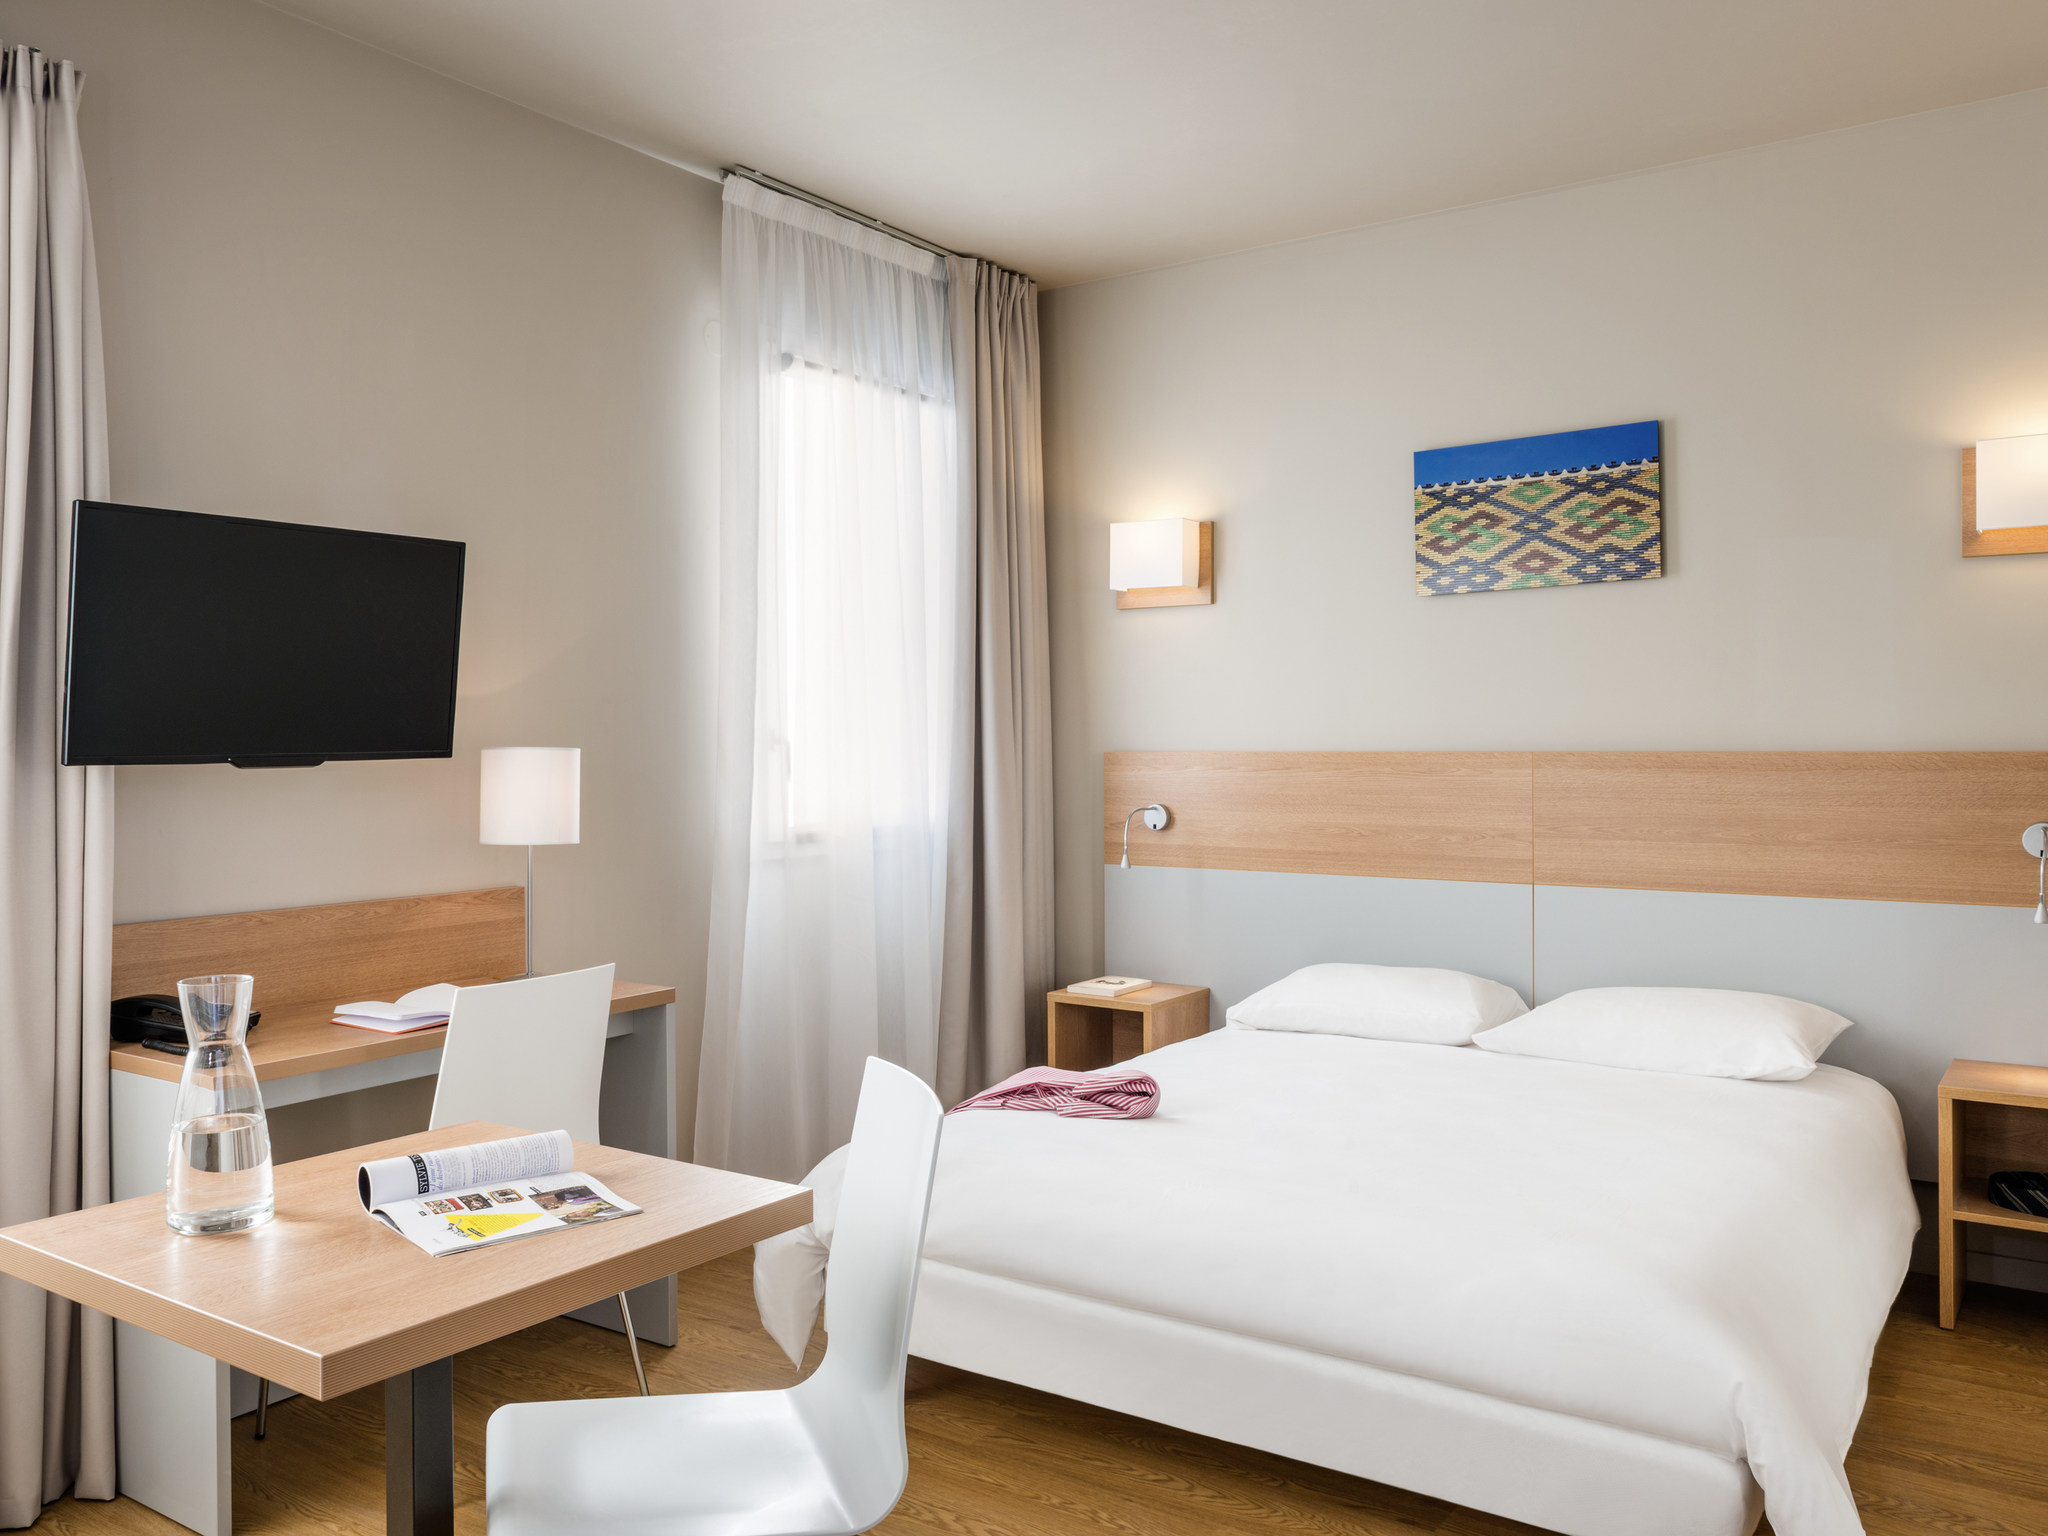 فندق - Aparthotel Adagio access Dijon République